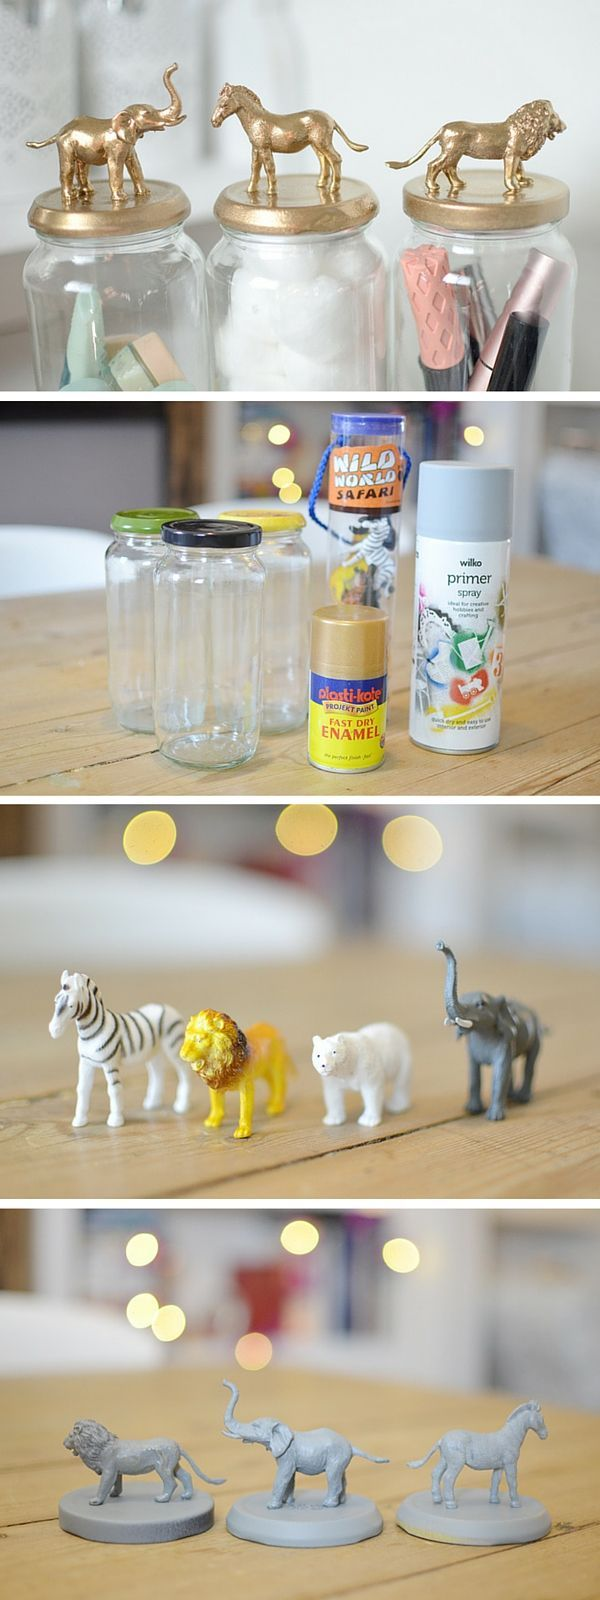 DIY Flower Jars Such A Cute And Fun Home Decor Craft Idea Using